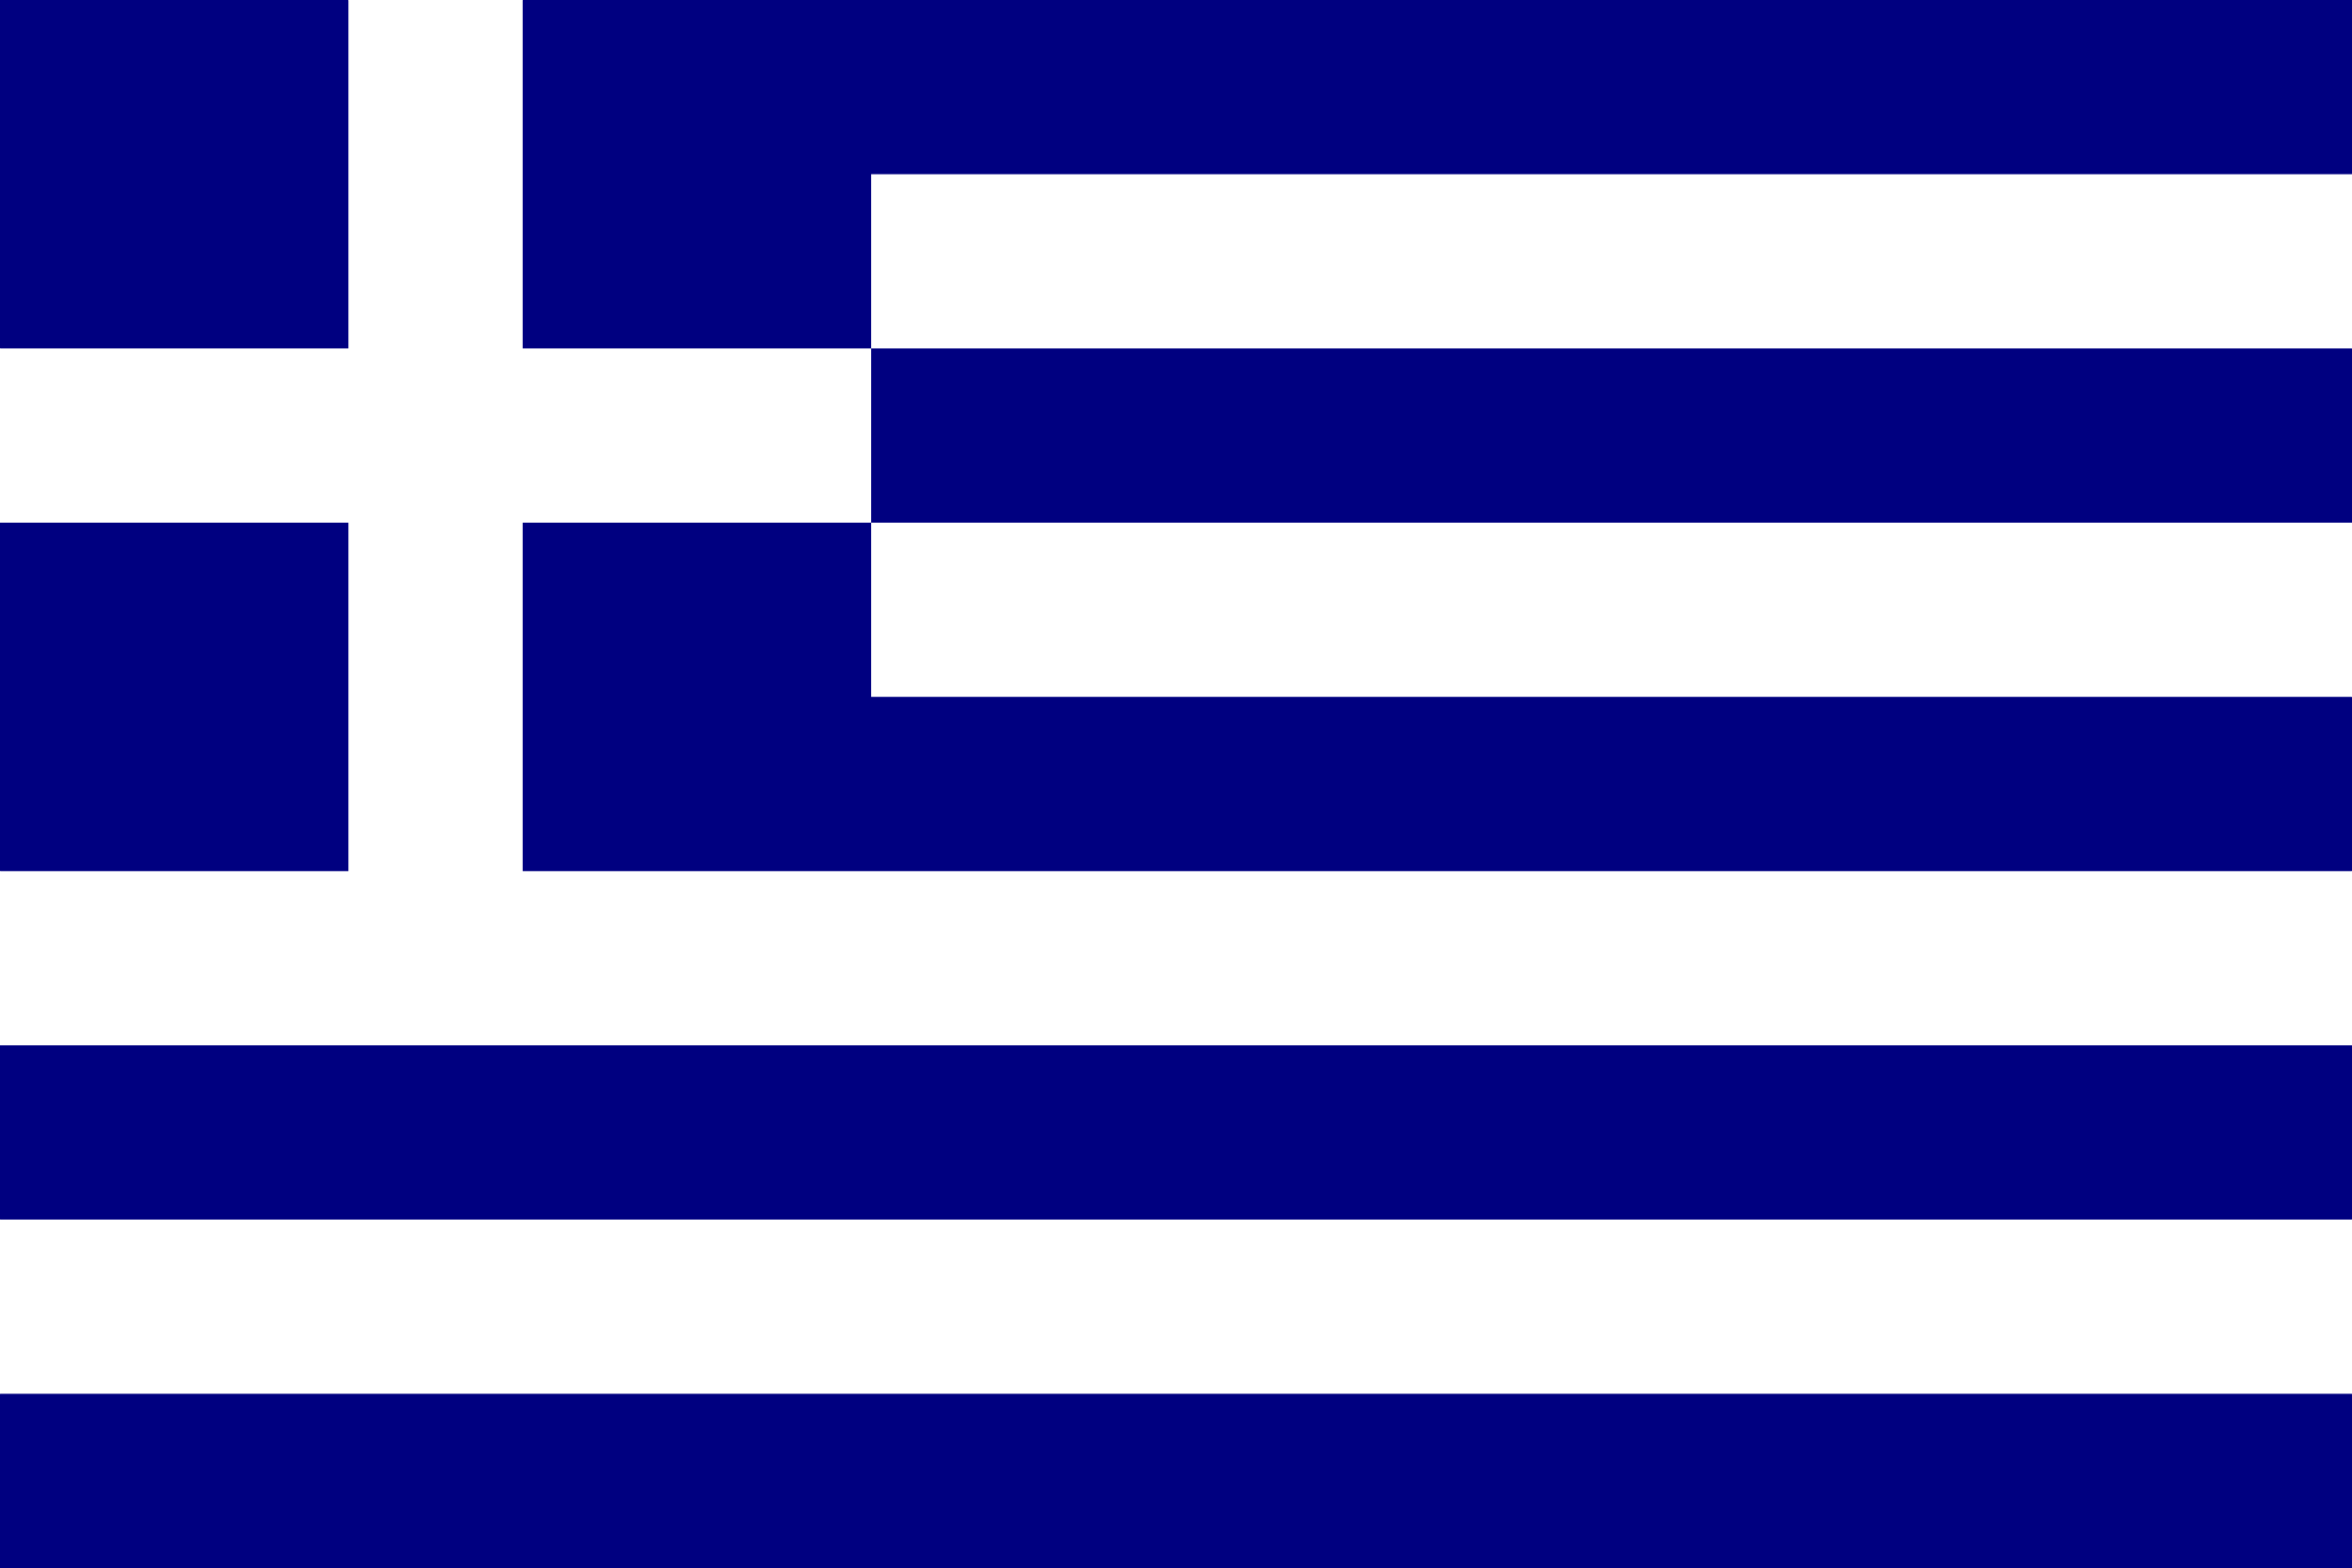 Grèce, pays, emblème, logo, symbole - Fonds d'écran HD - Professor-falken.com